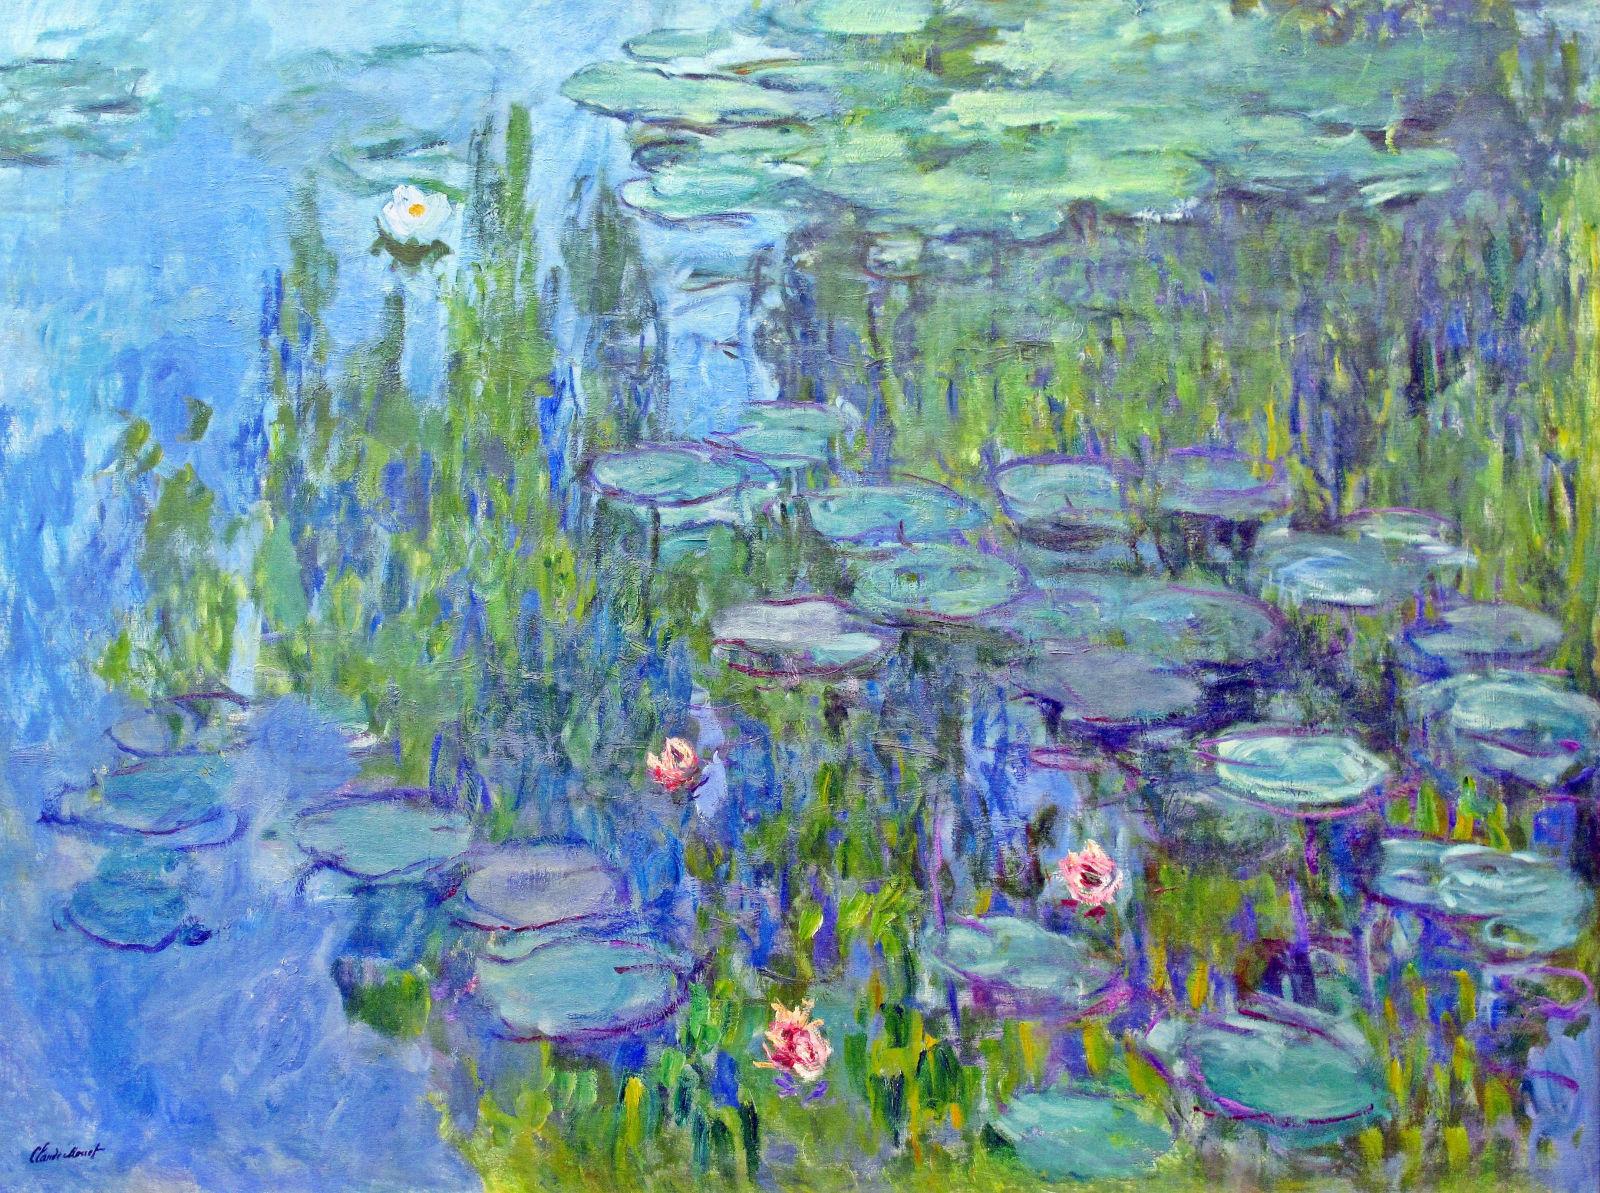 monet's water lilies and van gogh's